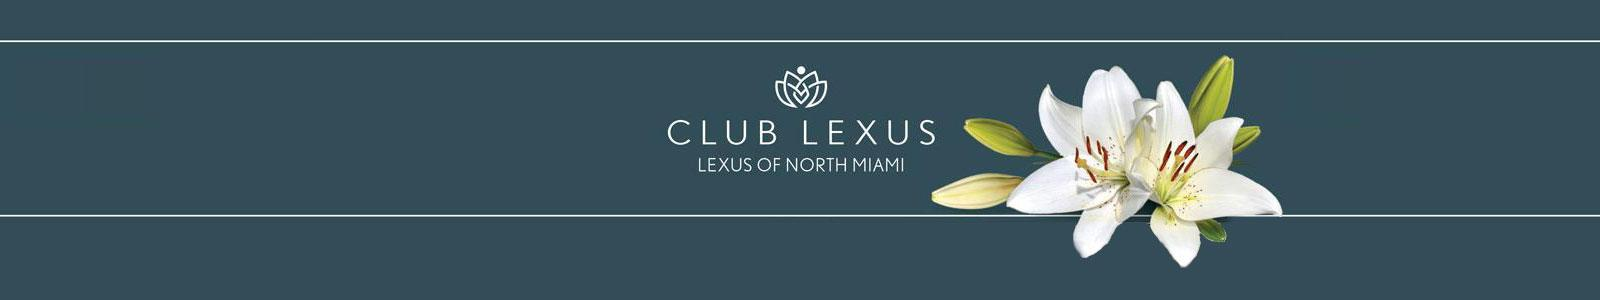 club-lexus